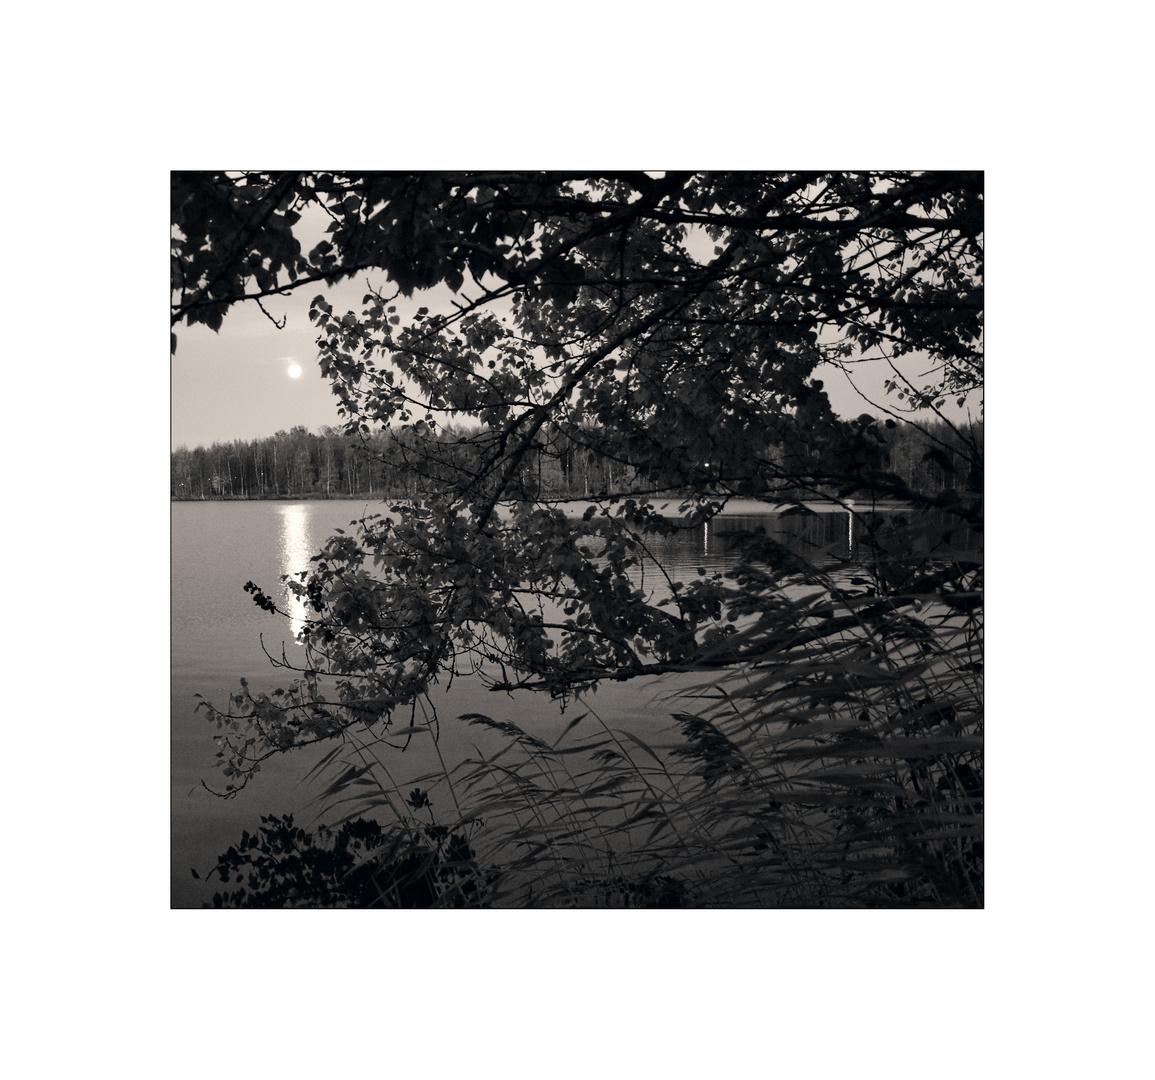 The moon over the trees - Vaasa